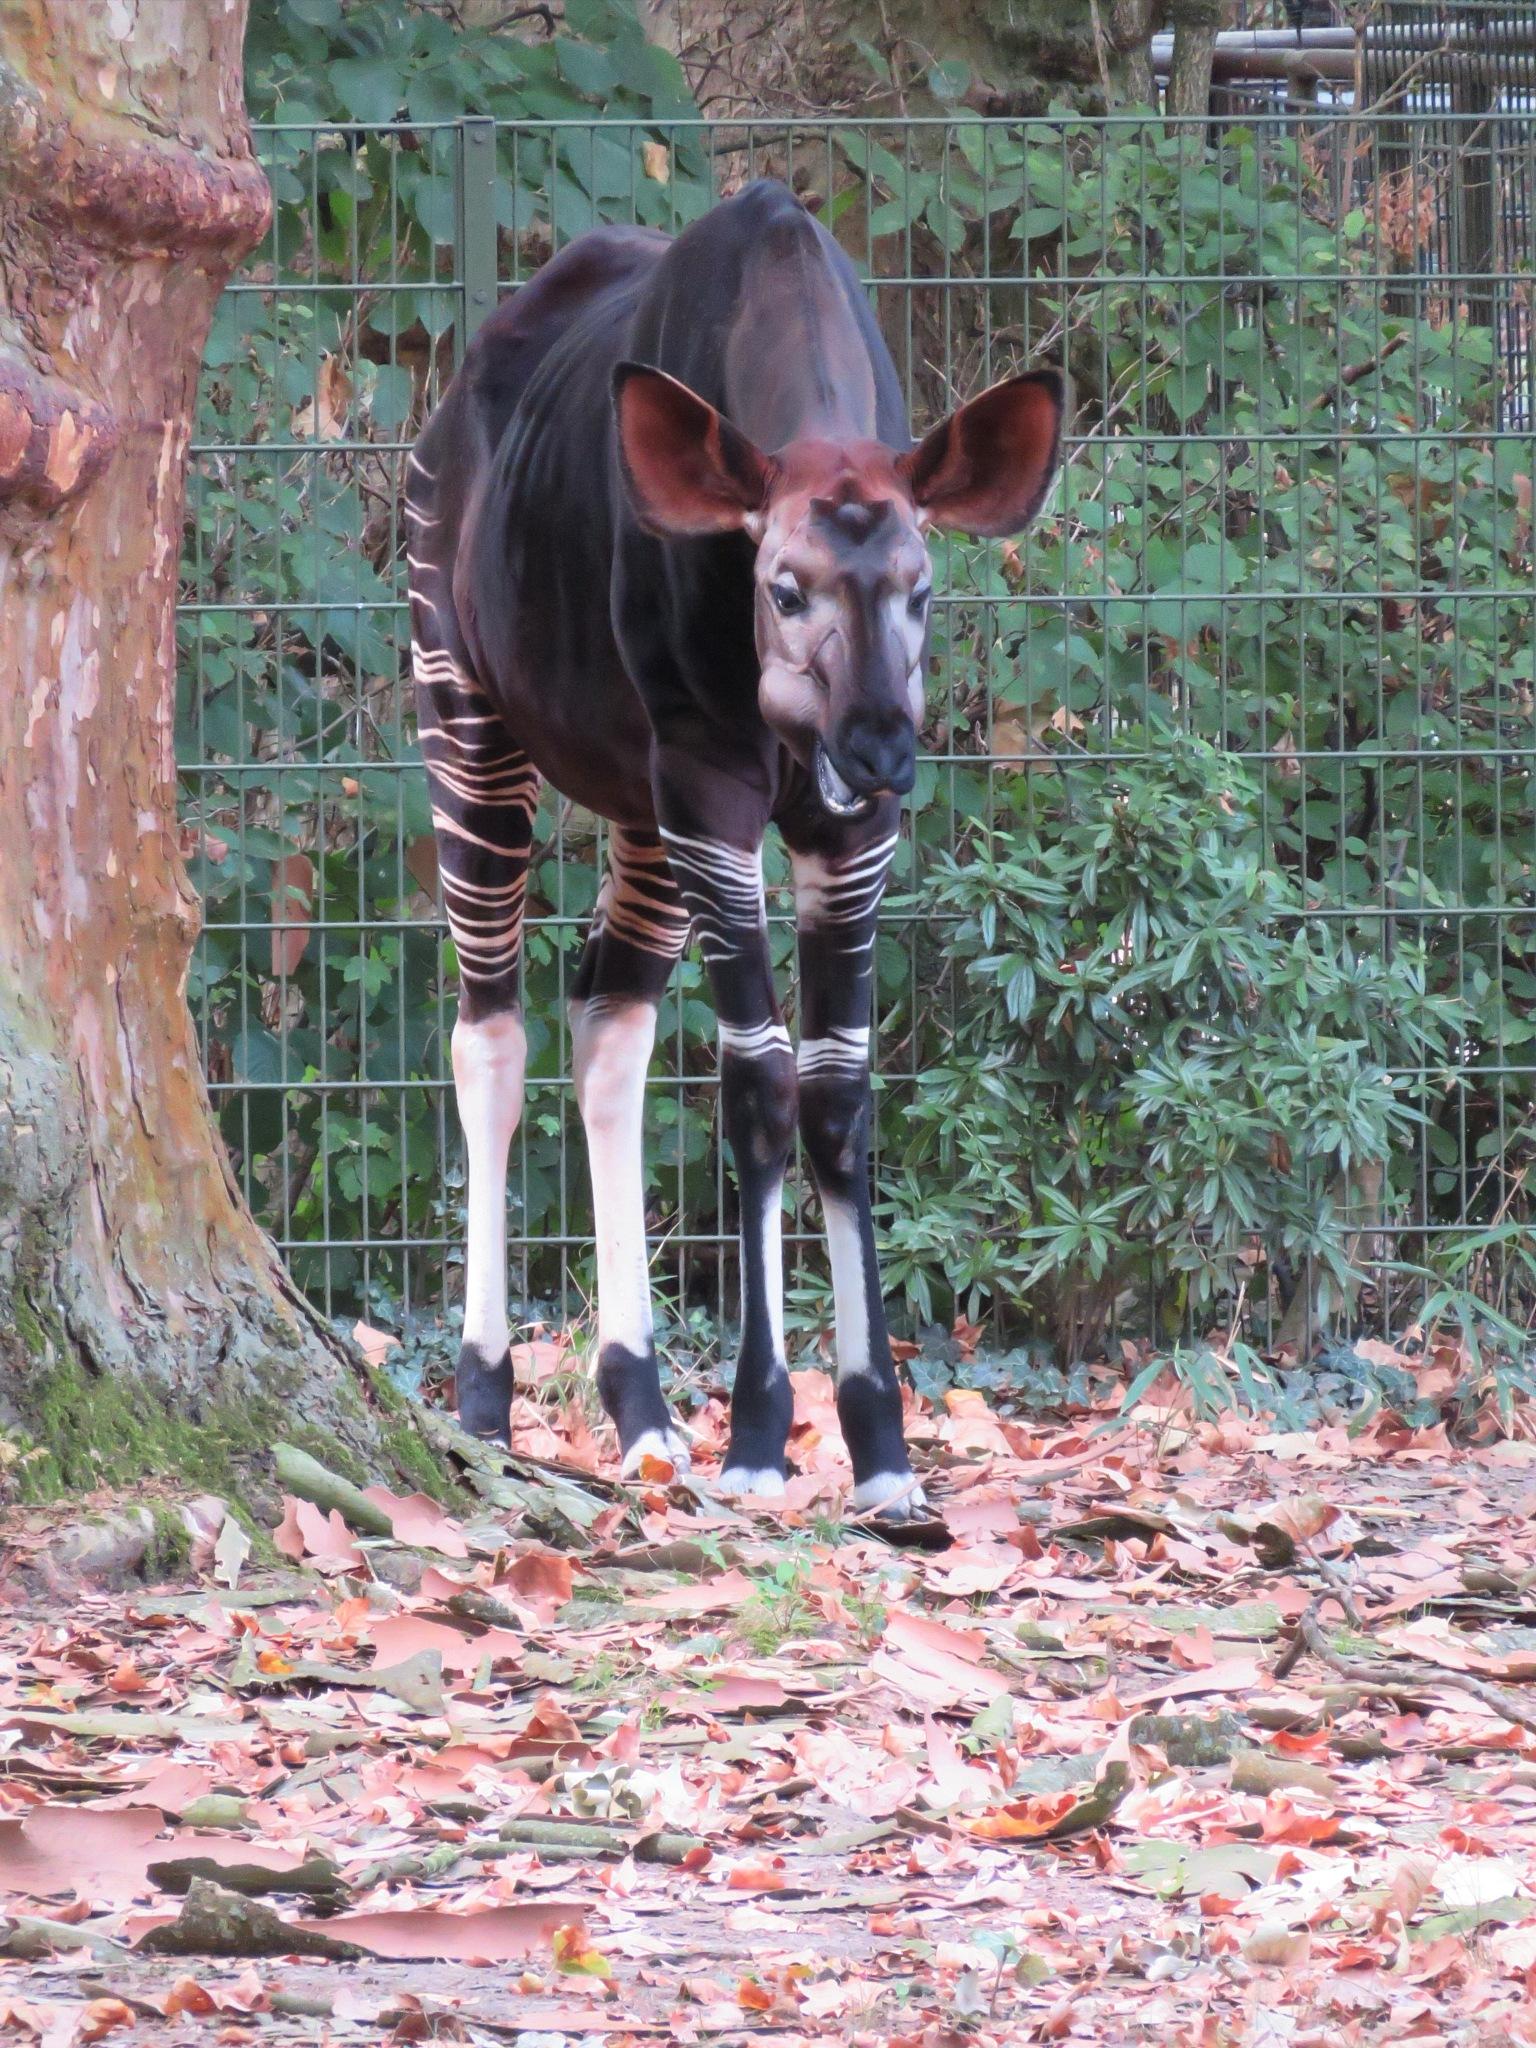 Okapi by Rolf-Dieter Balindt